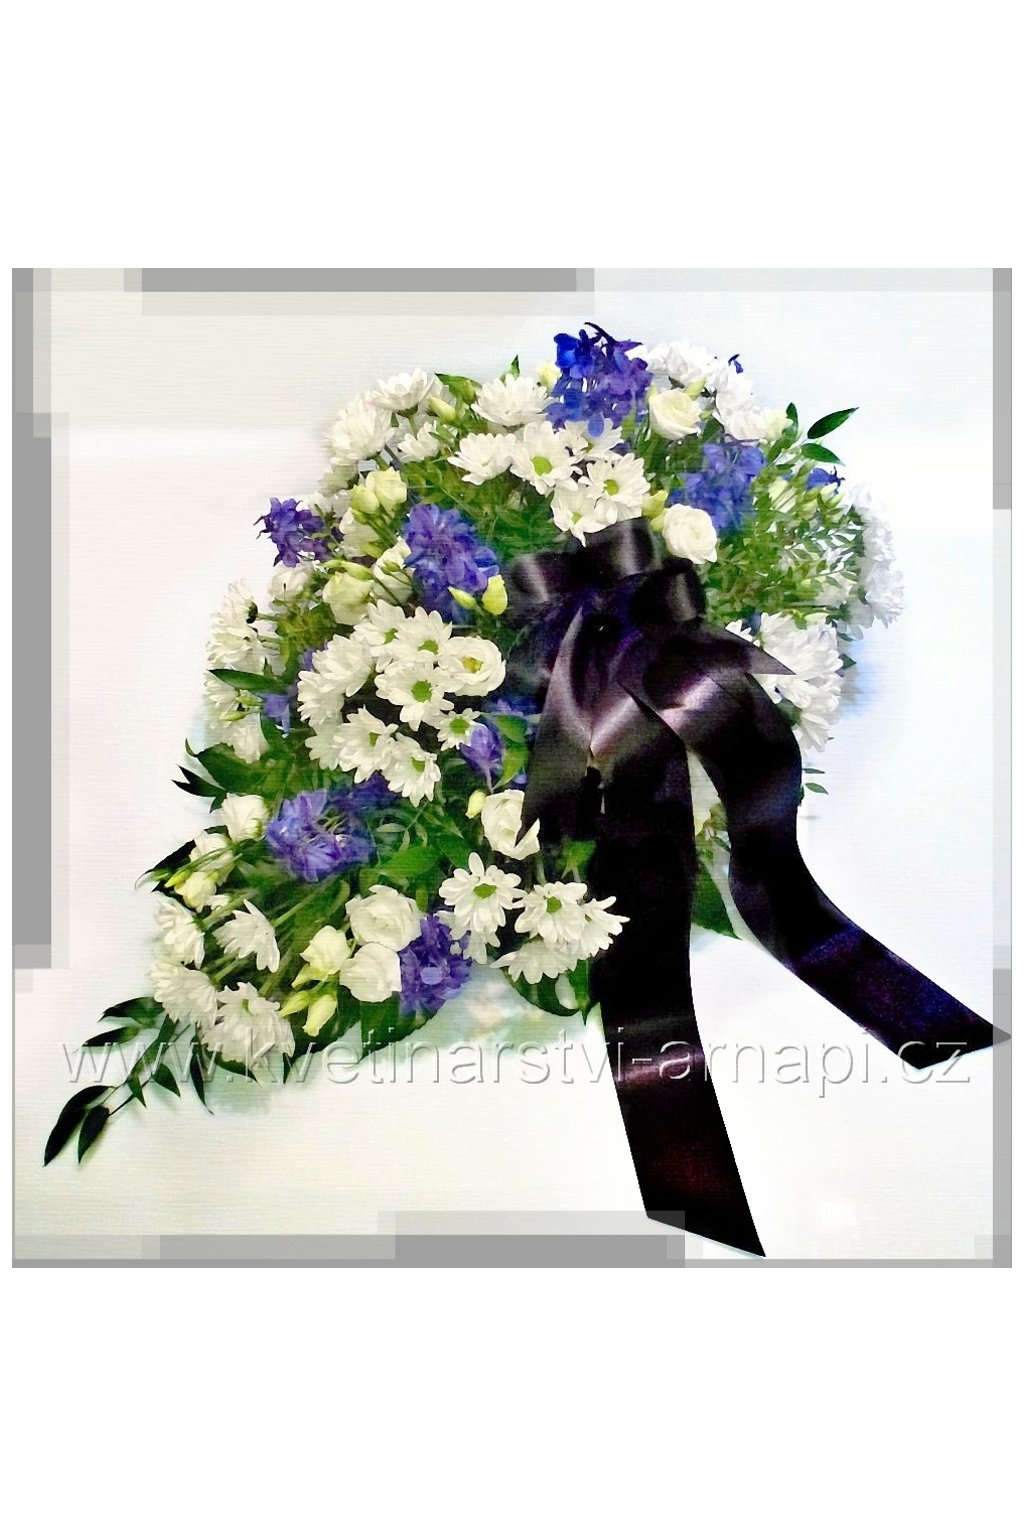 smutecni kytice v drzaku kvetinarstvi arnapi bilo modra rozvoz